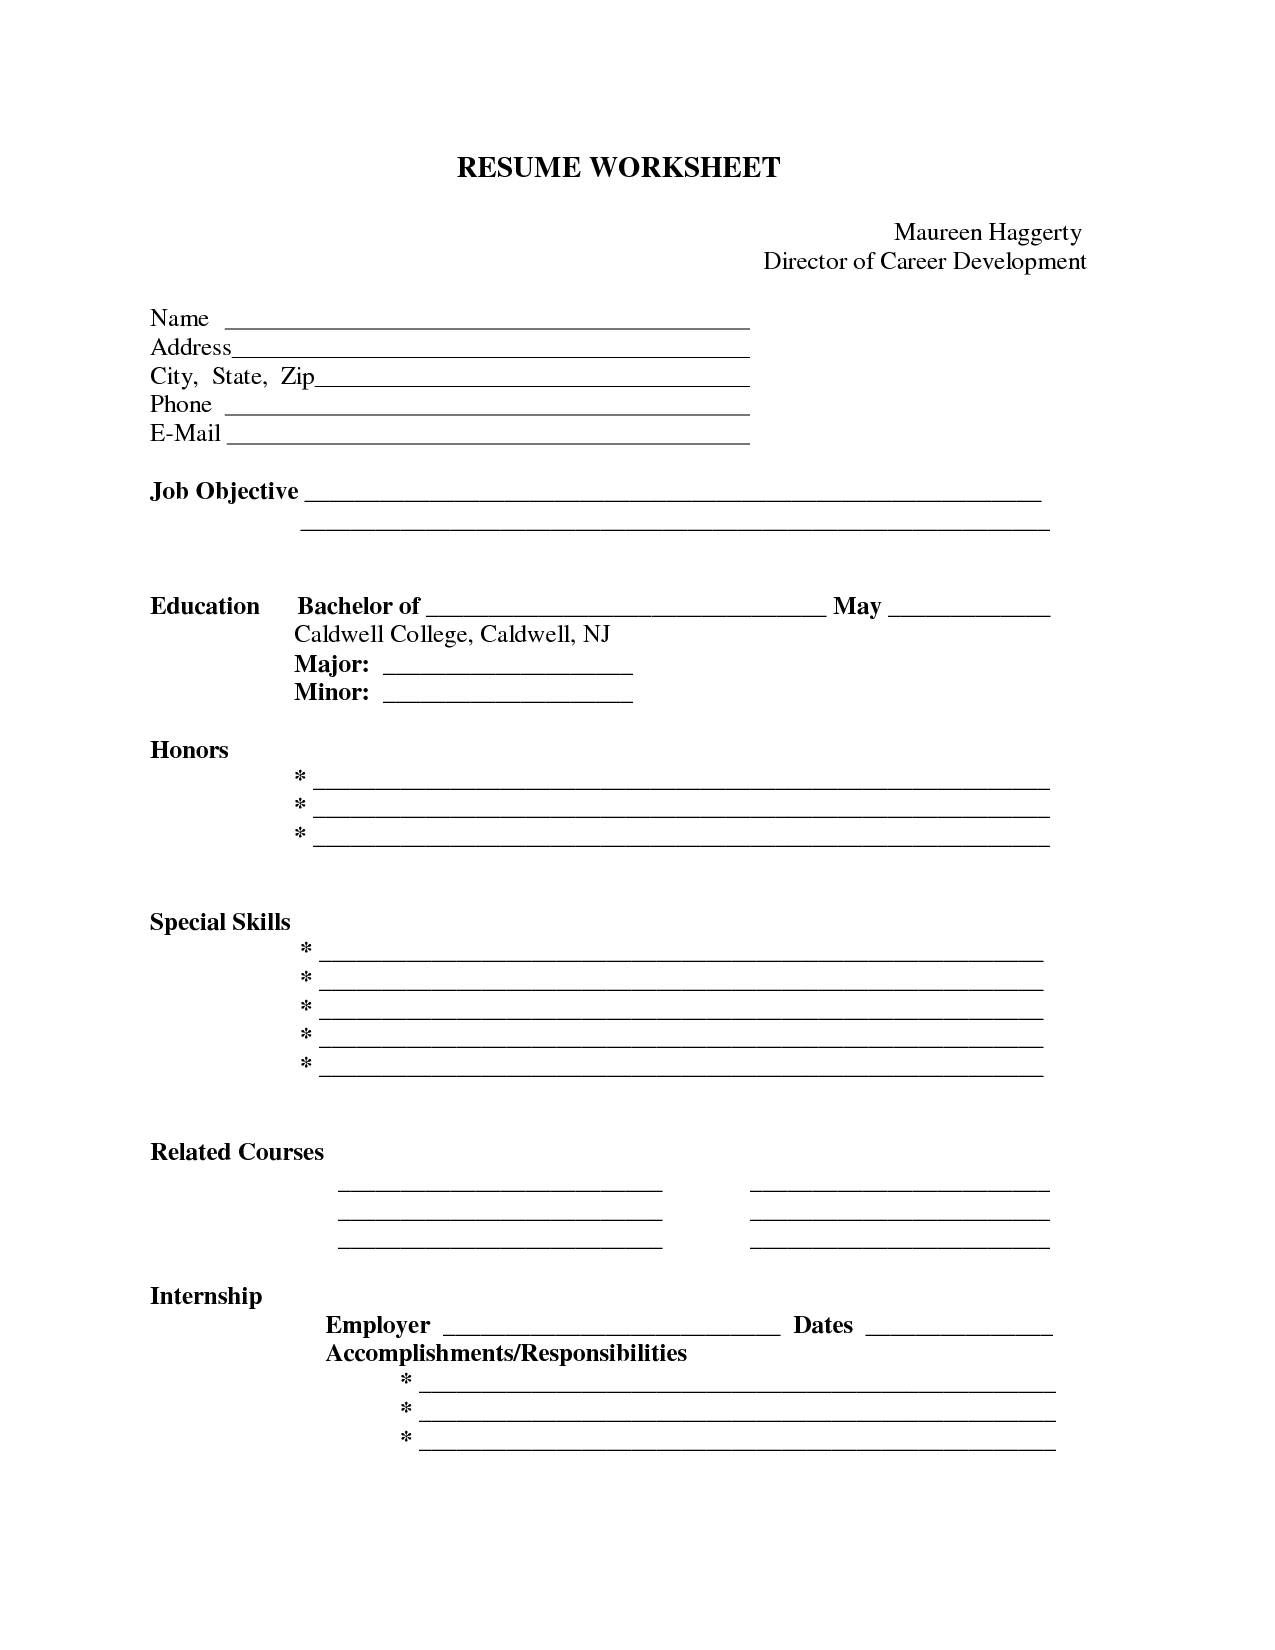 Pin Oleh Jobresume Di Resume Career Termplate Free | Resume Form - Free Printable Blank Resume